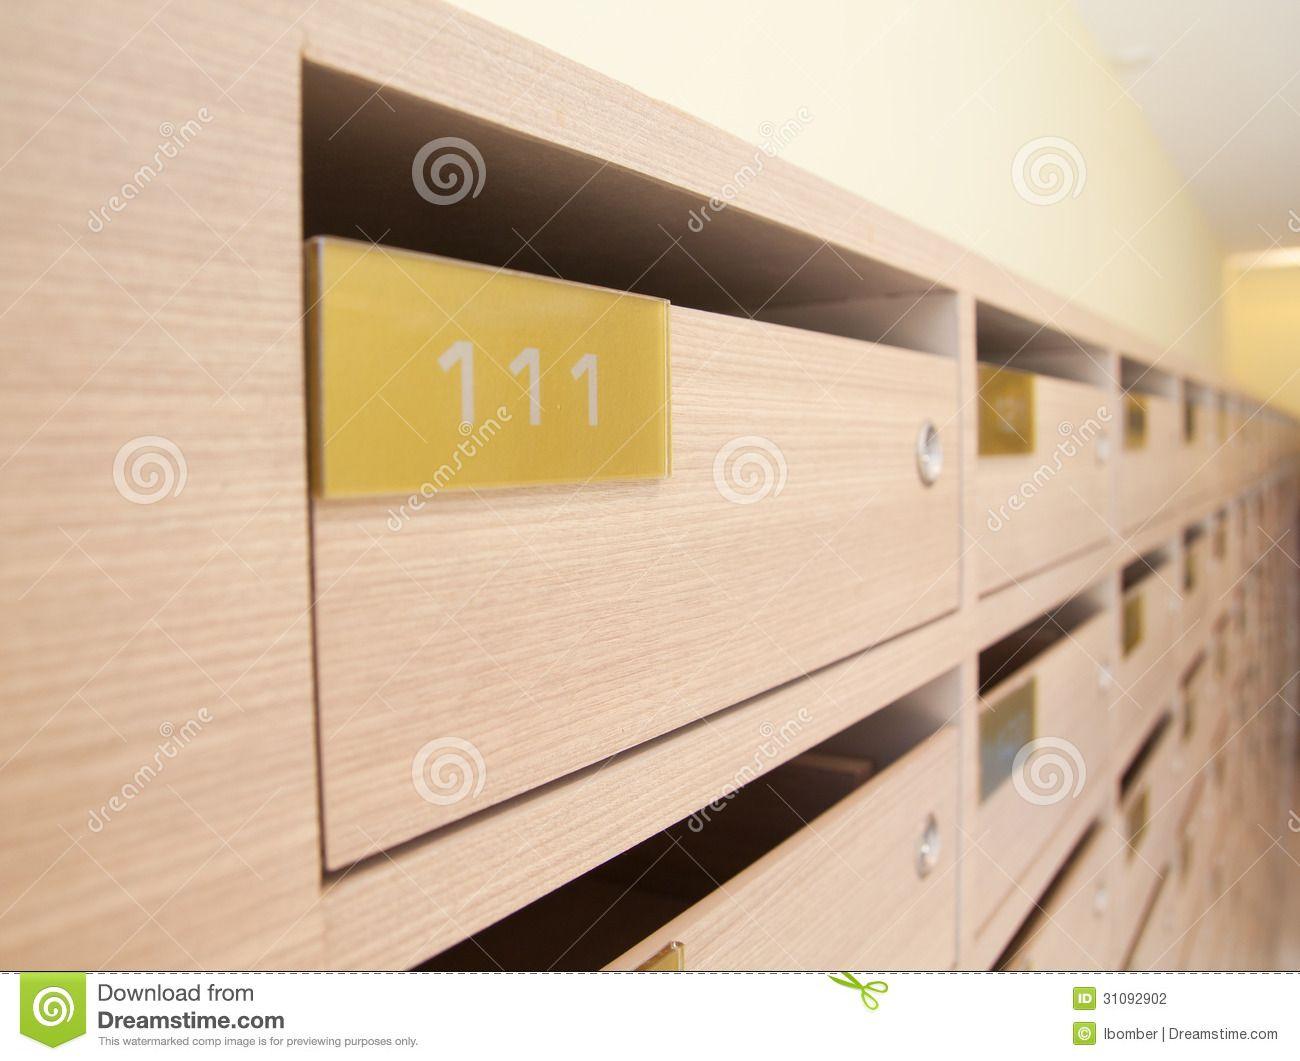 apartment mailbox design - google search | interiors - mercé